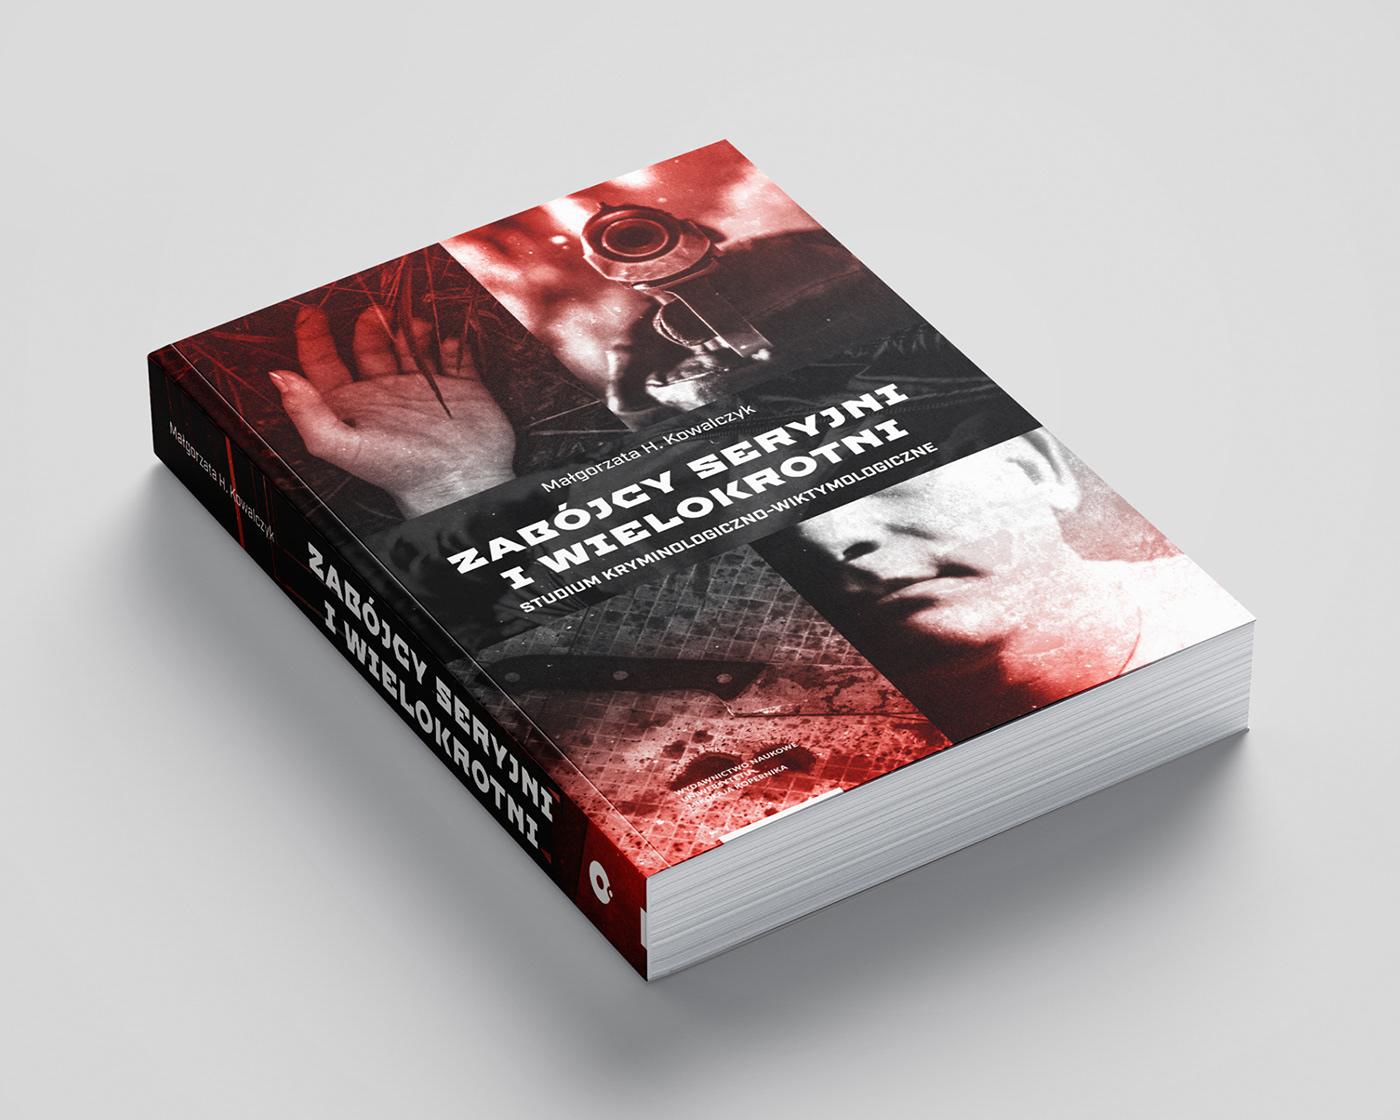 book cover crime investigation książka murder okładka okładka książki serial killer victim violence